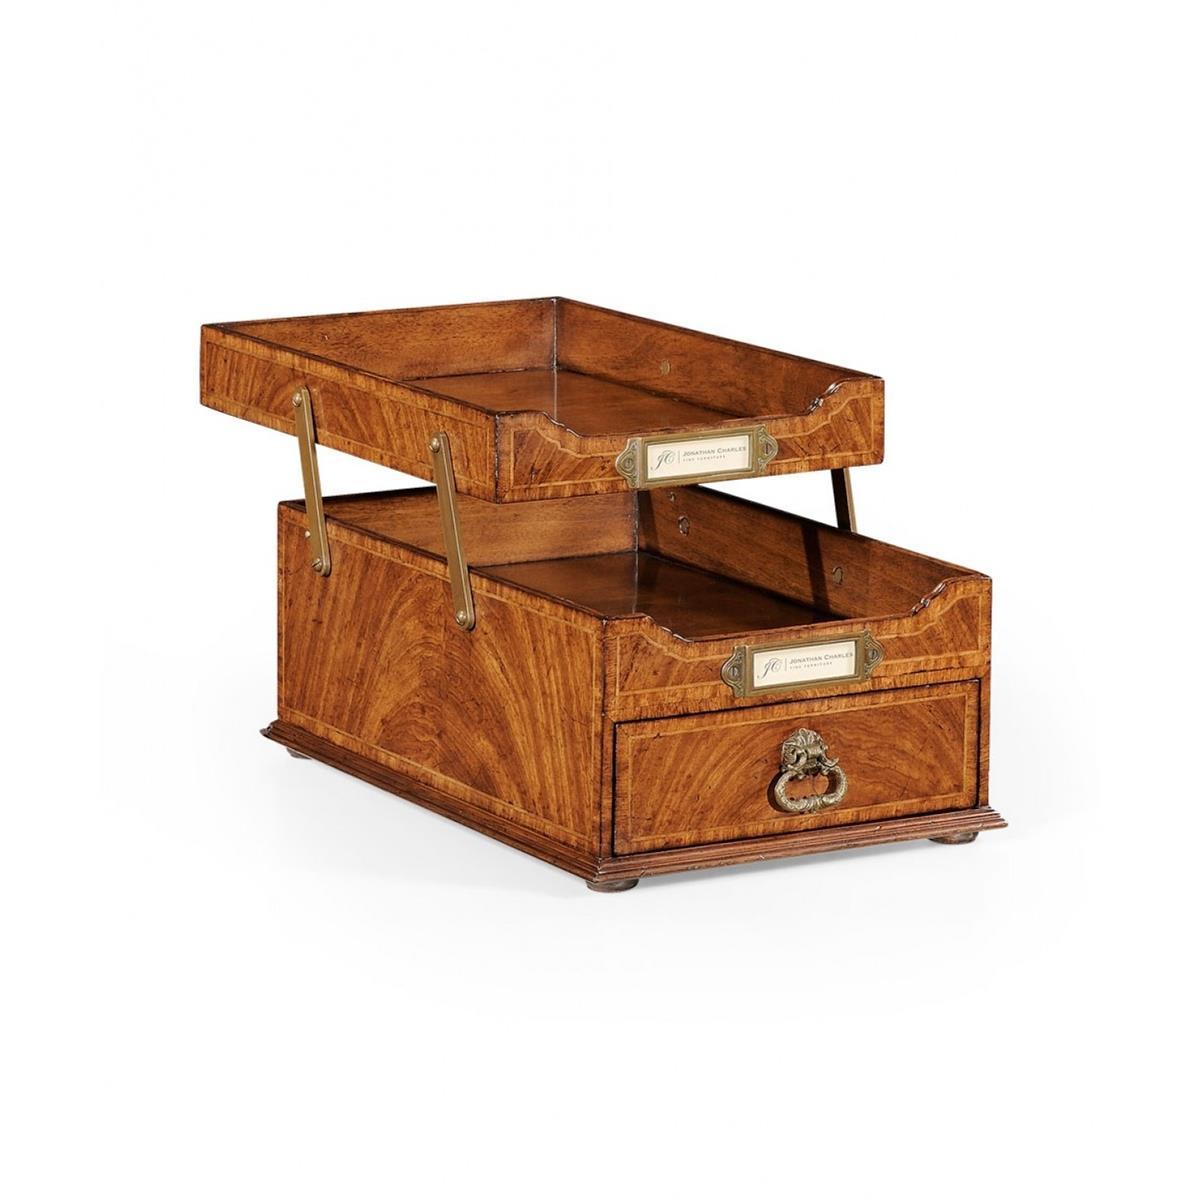 494265 Crotch Walnut Letter Tray with Drawer - на 360.ru: цены, описание, характеристики, где купить в Москве.